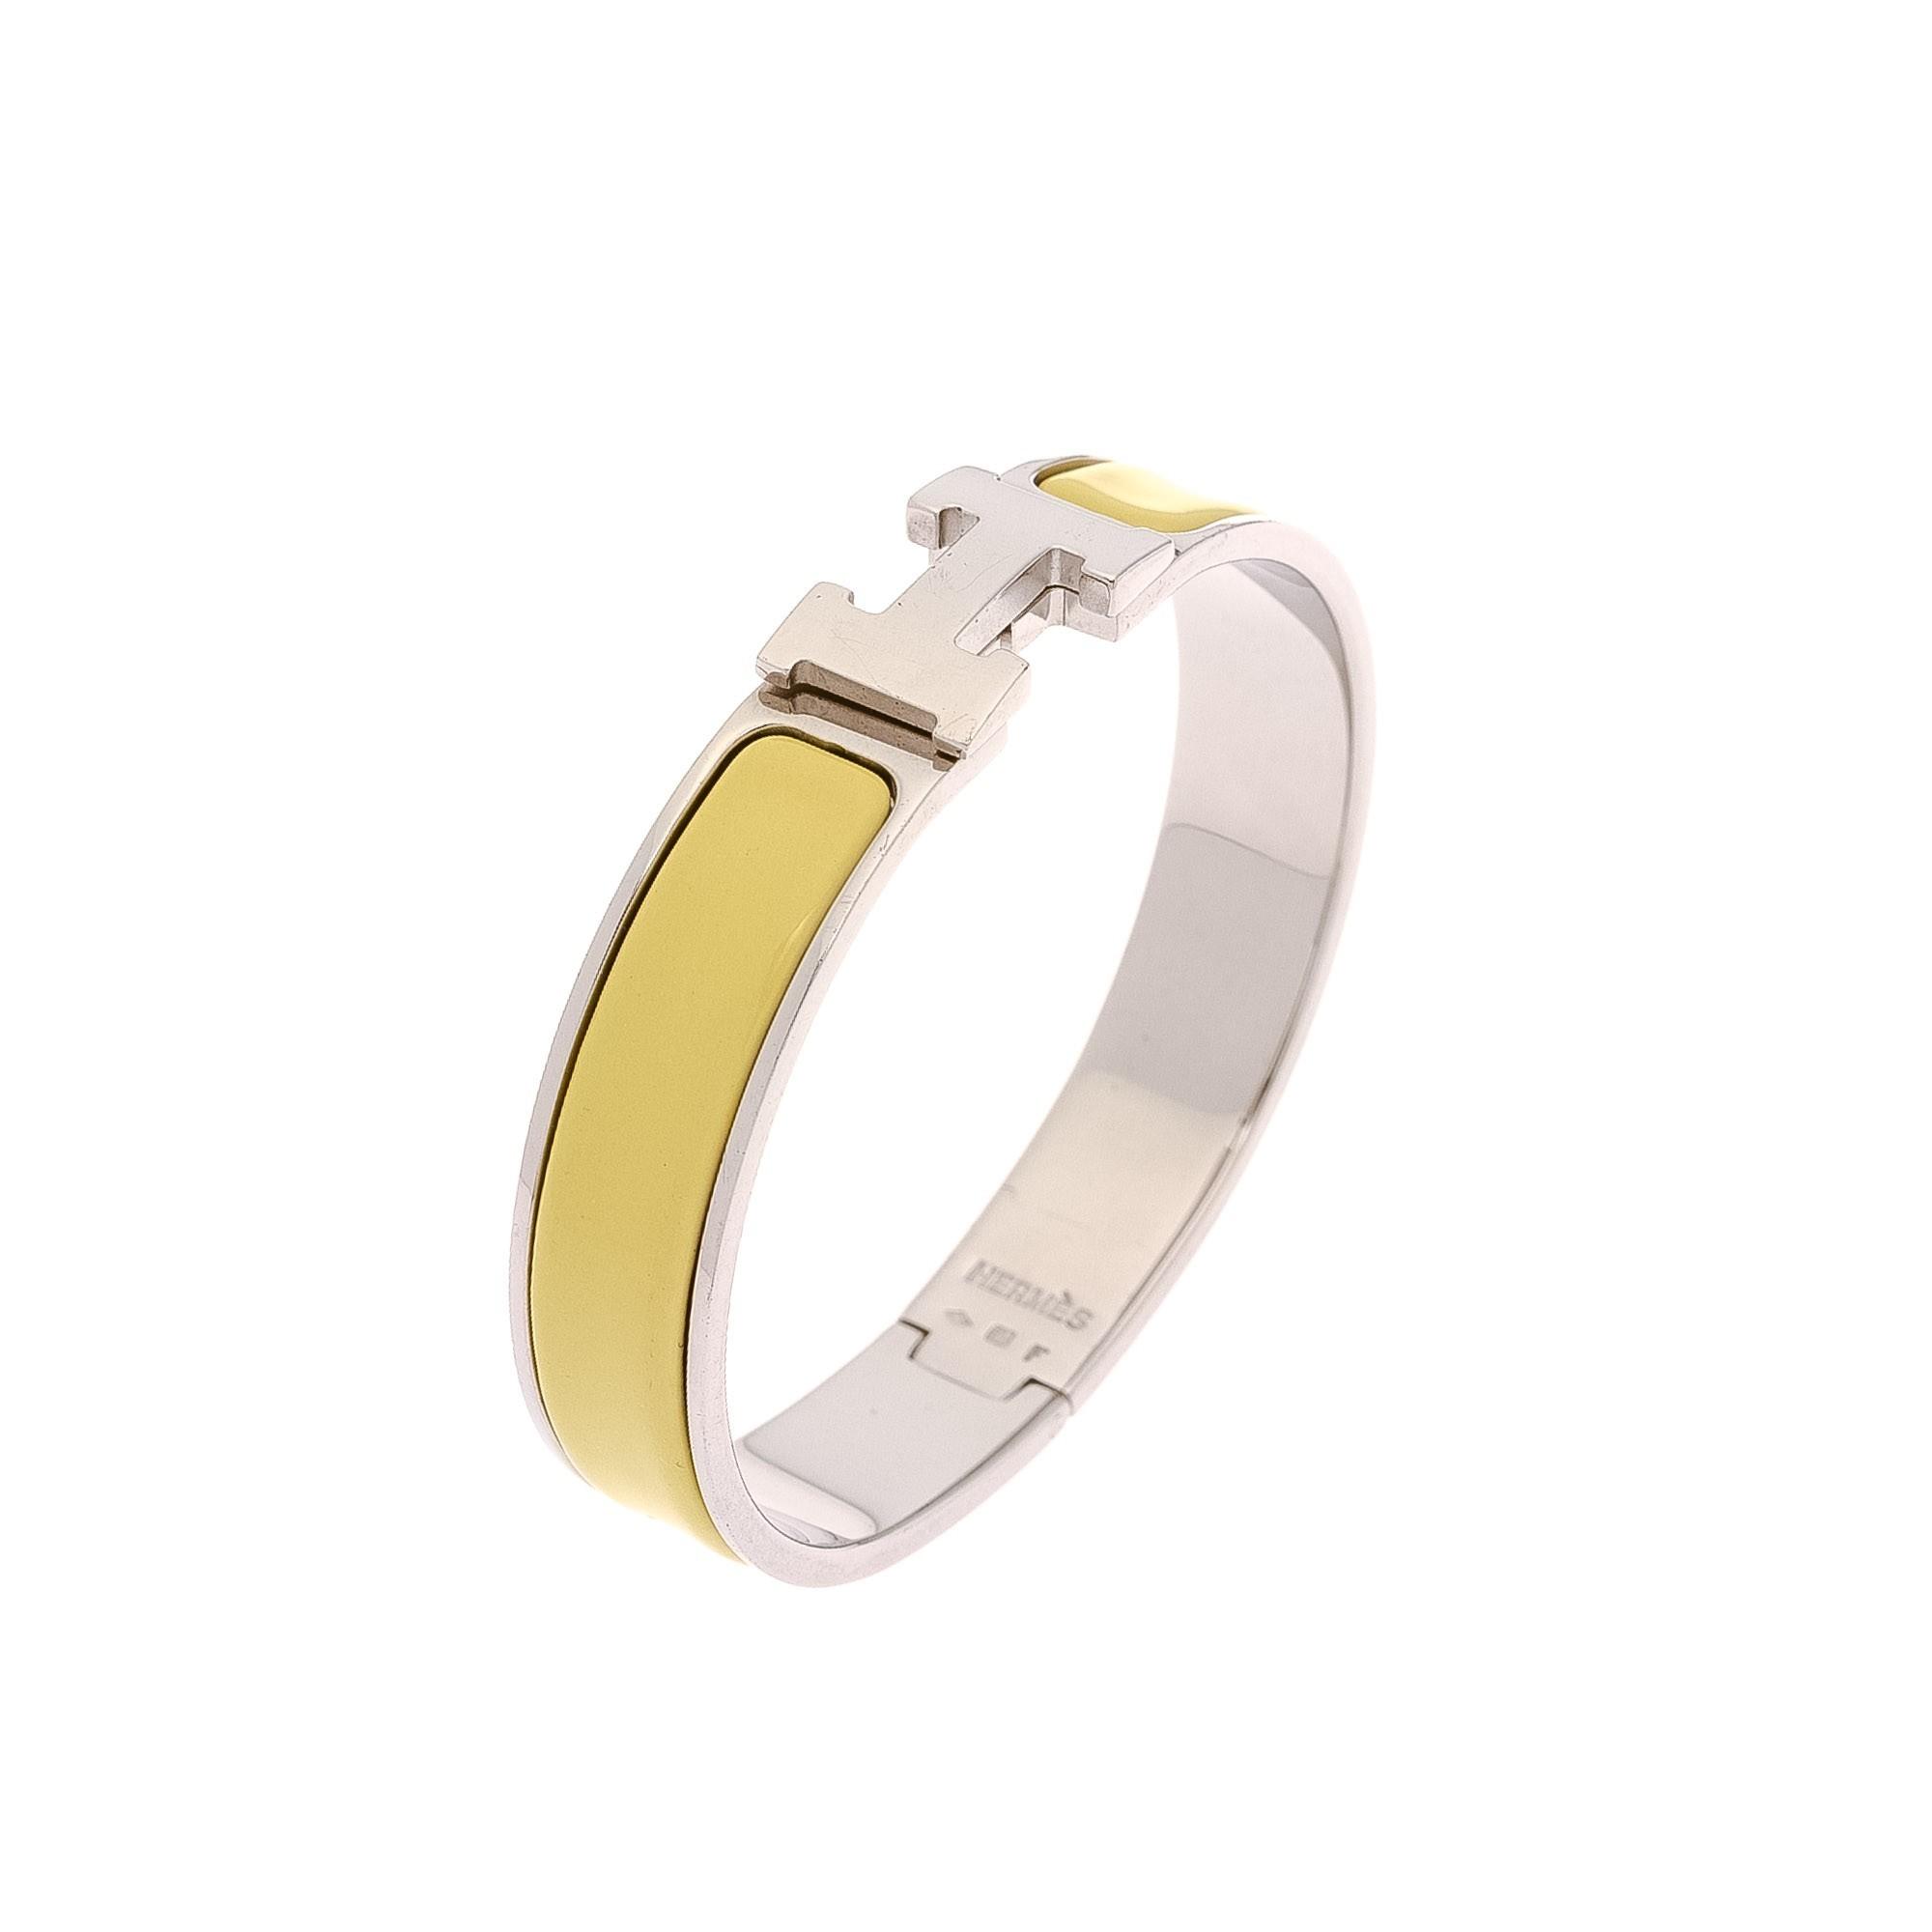 herm 232 s clic clac h bangle yellow palladium plated brass leather bracelet bangle lxr co